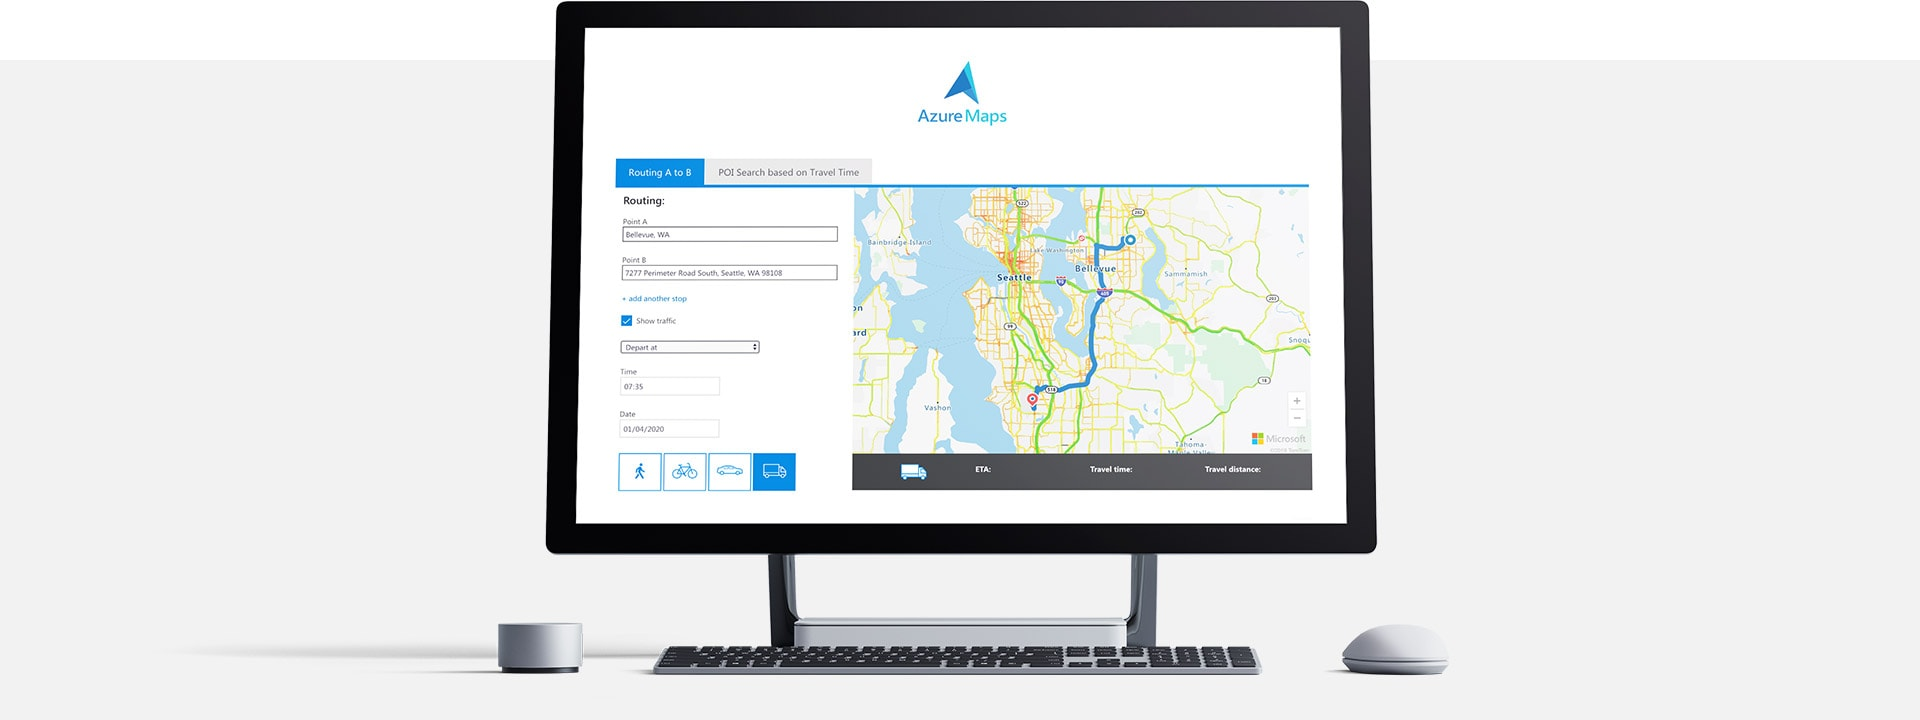 Microsoft Azure Maps